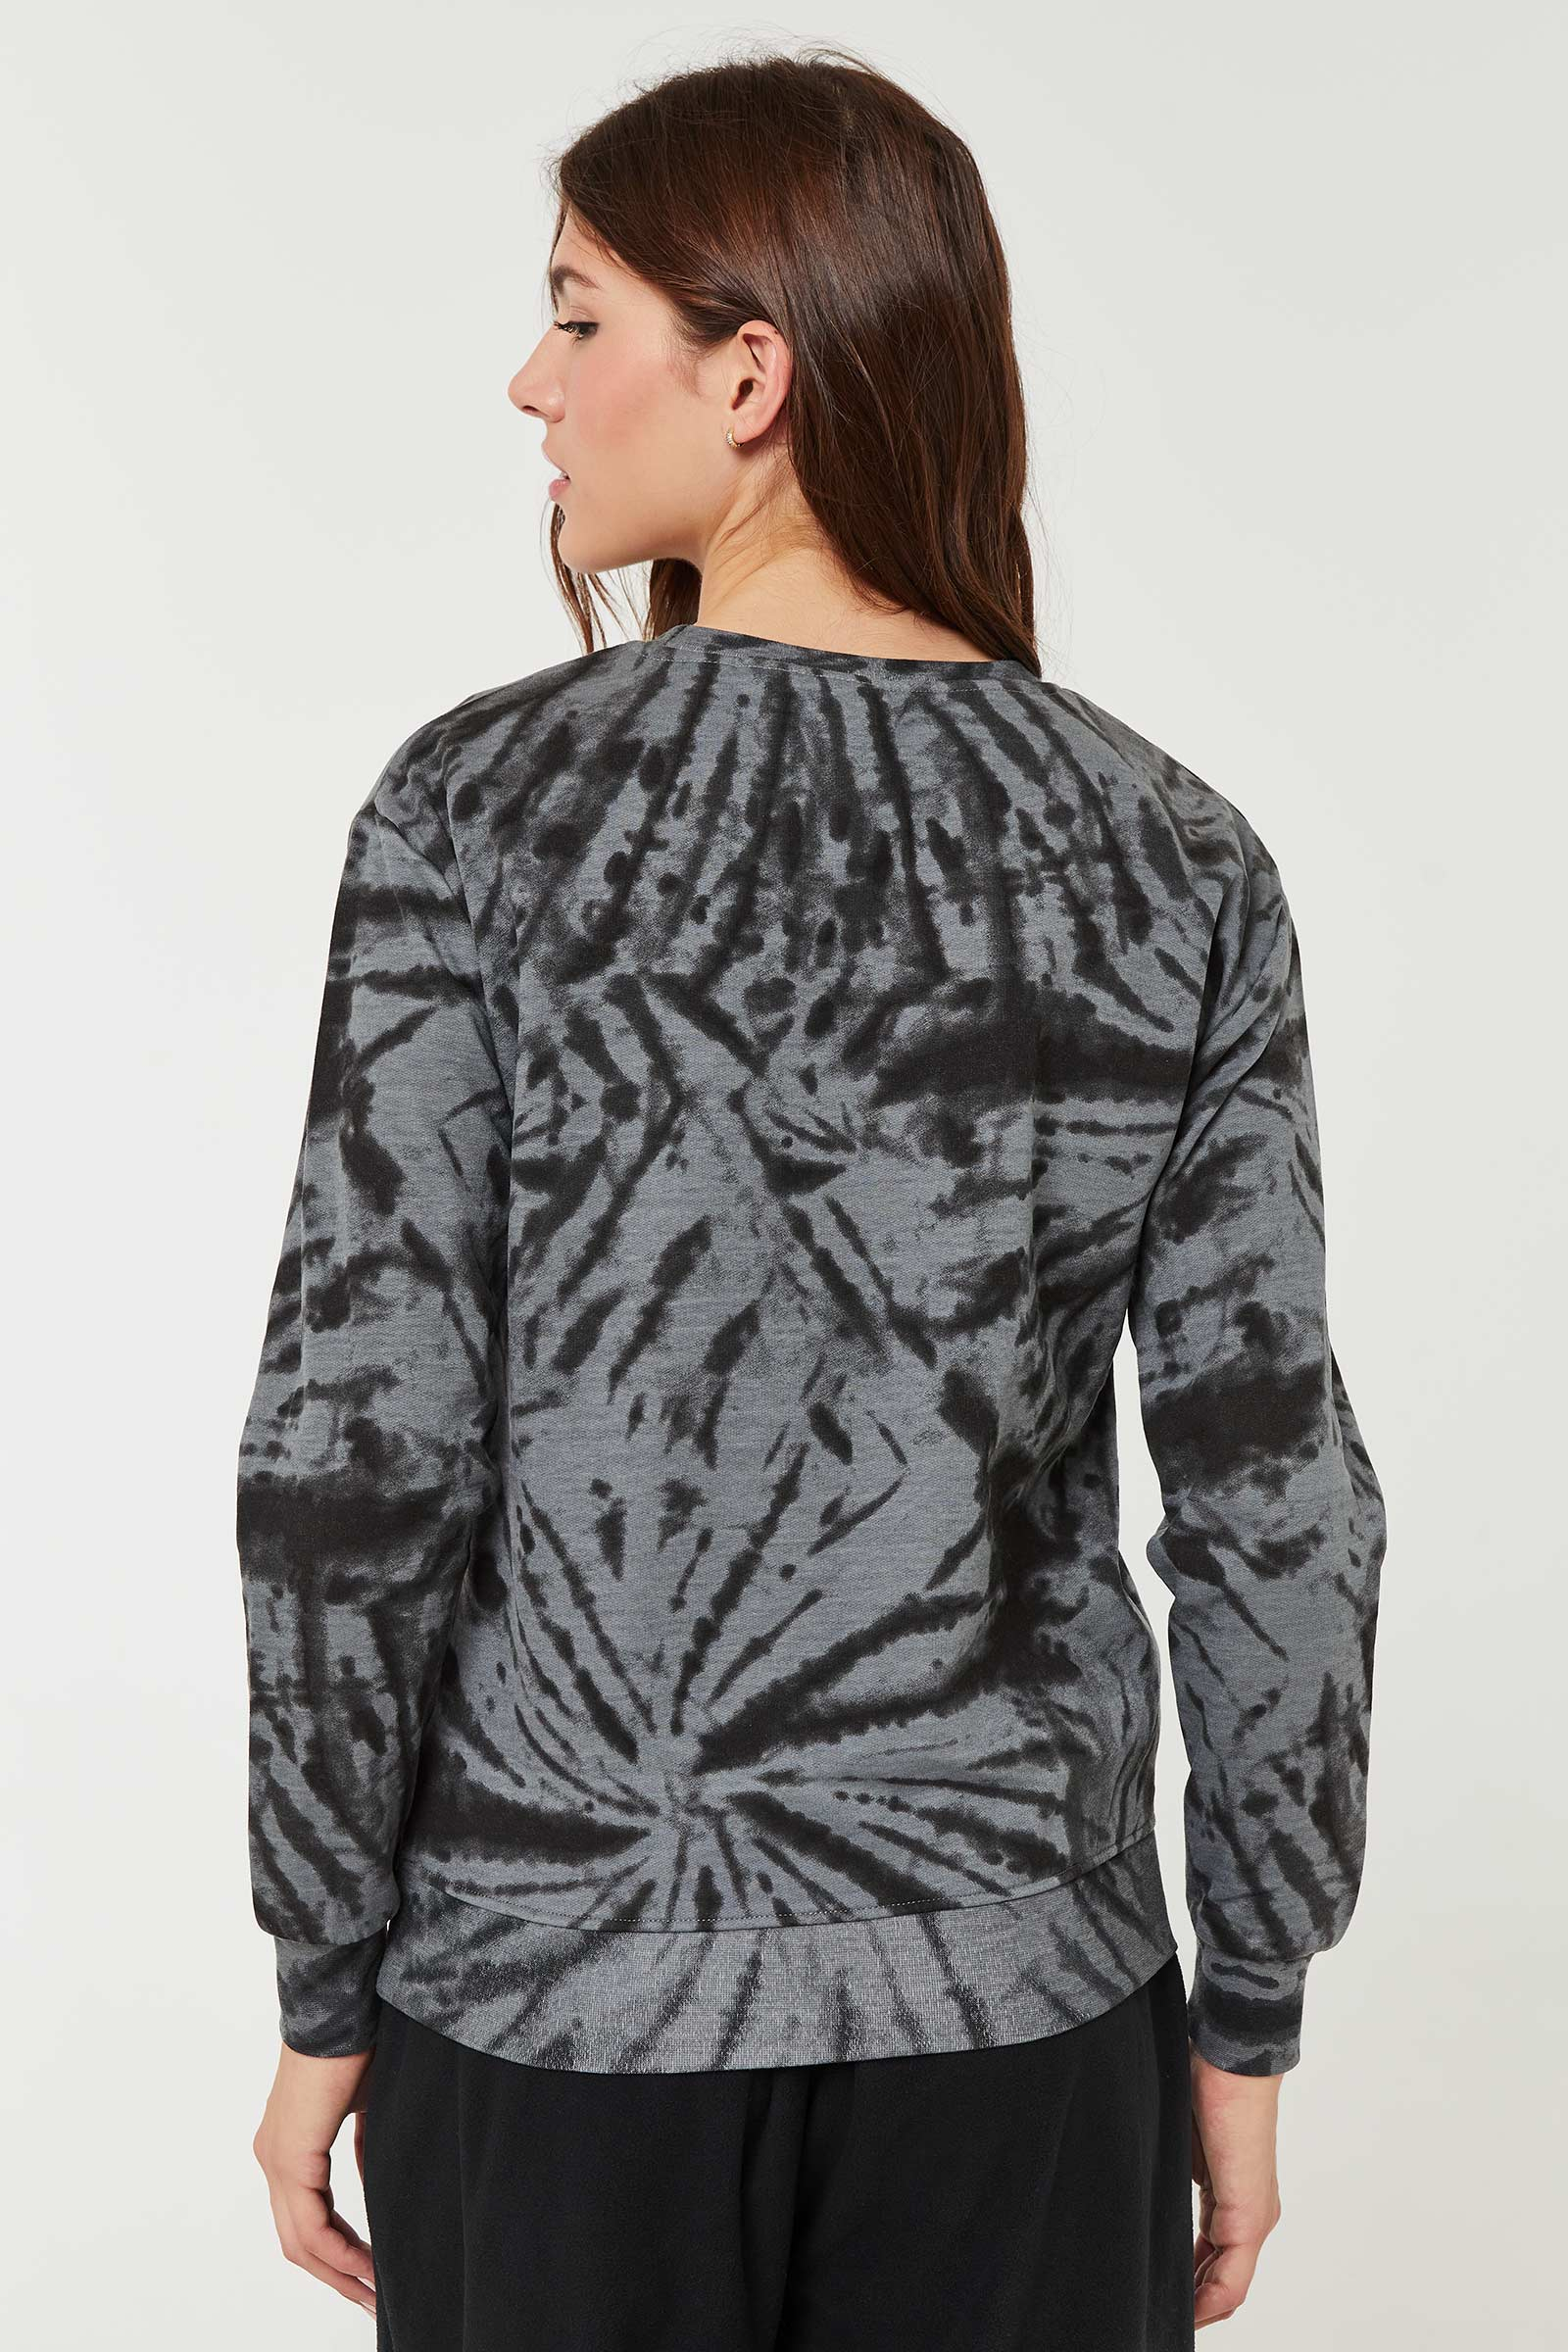 Tie-Dye Goosebumps Sweatshirt